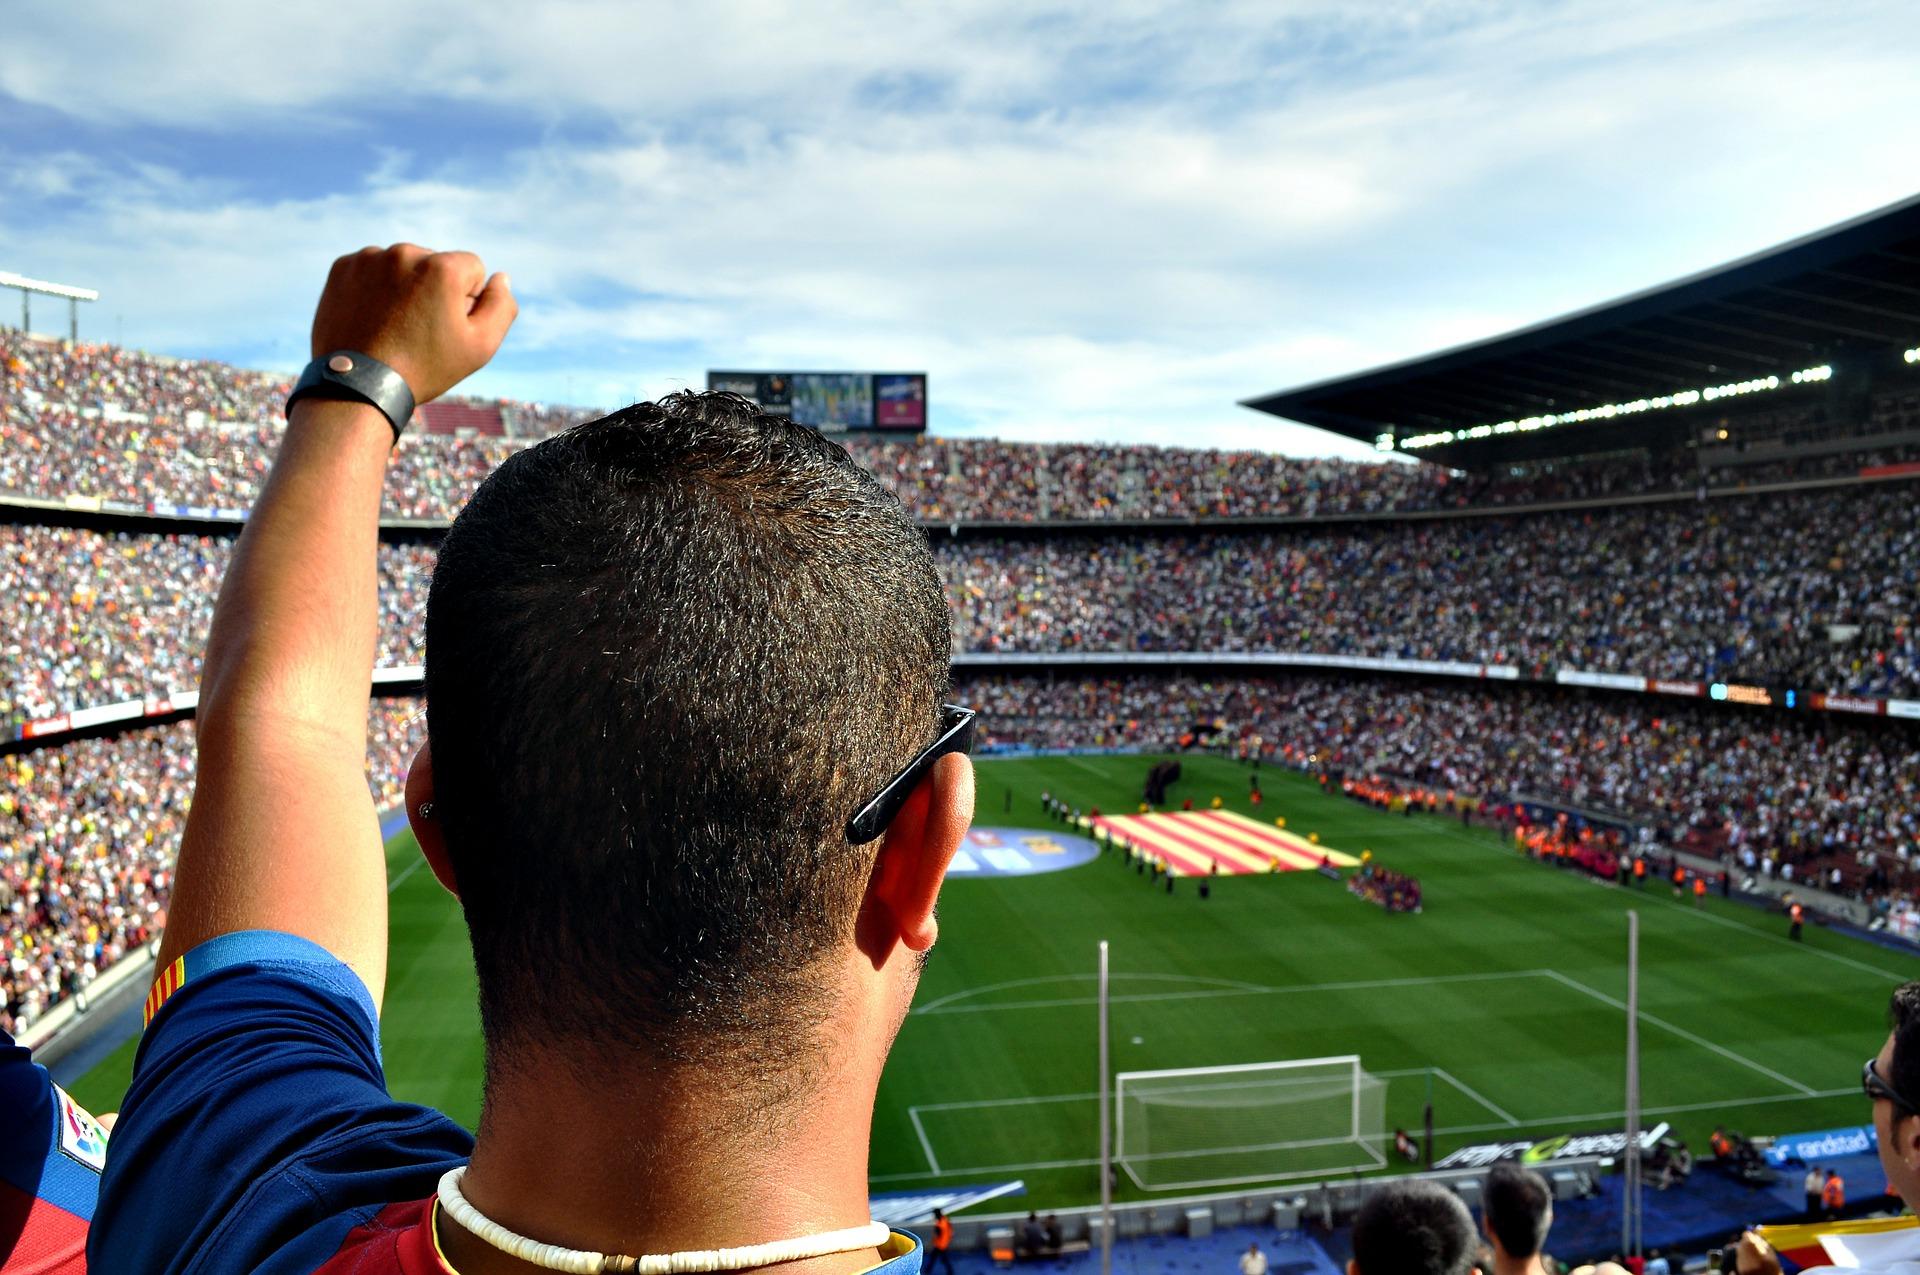 Барселона ФК фанат Камп Ноу Футбол Стадион Люди